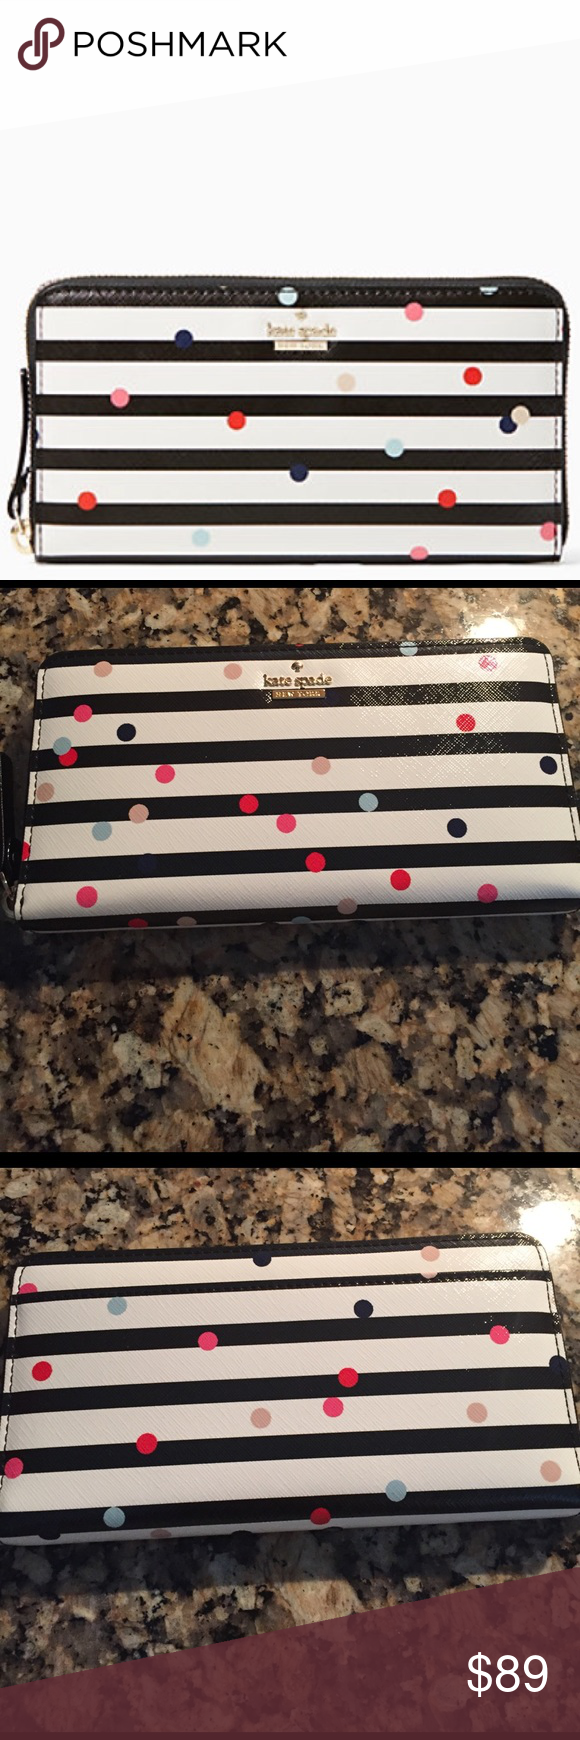 Kate Spade Wallet Confetti Dot Lacey. Lowest is $89. kate spade Bags Wallets